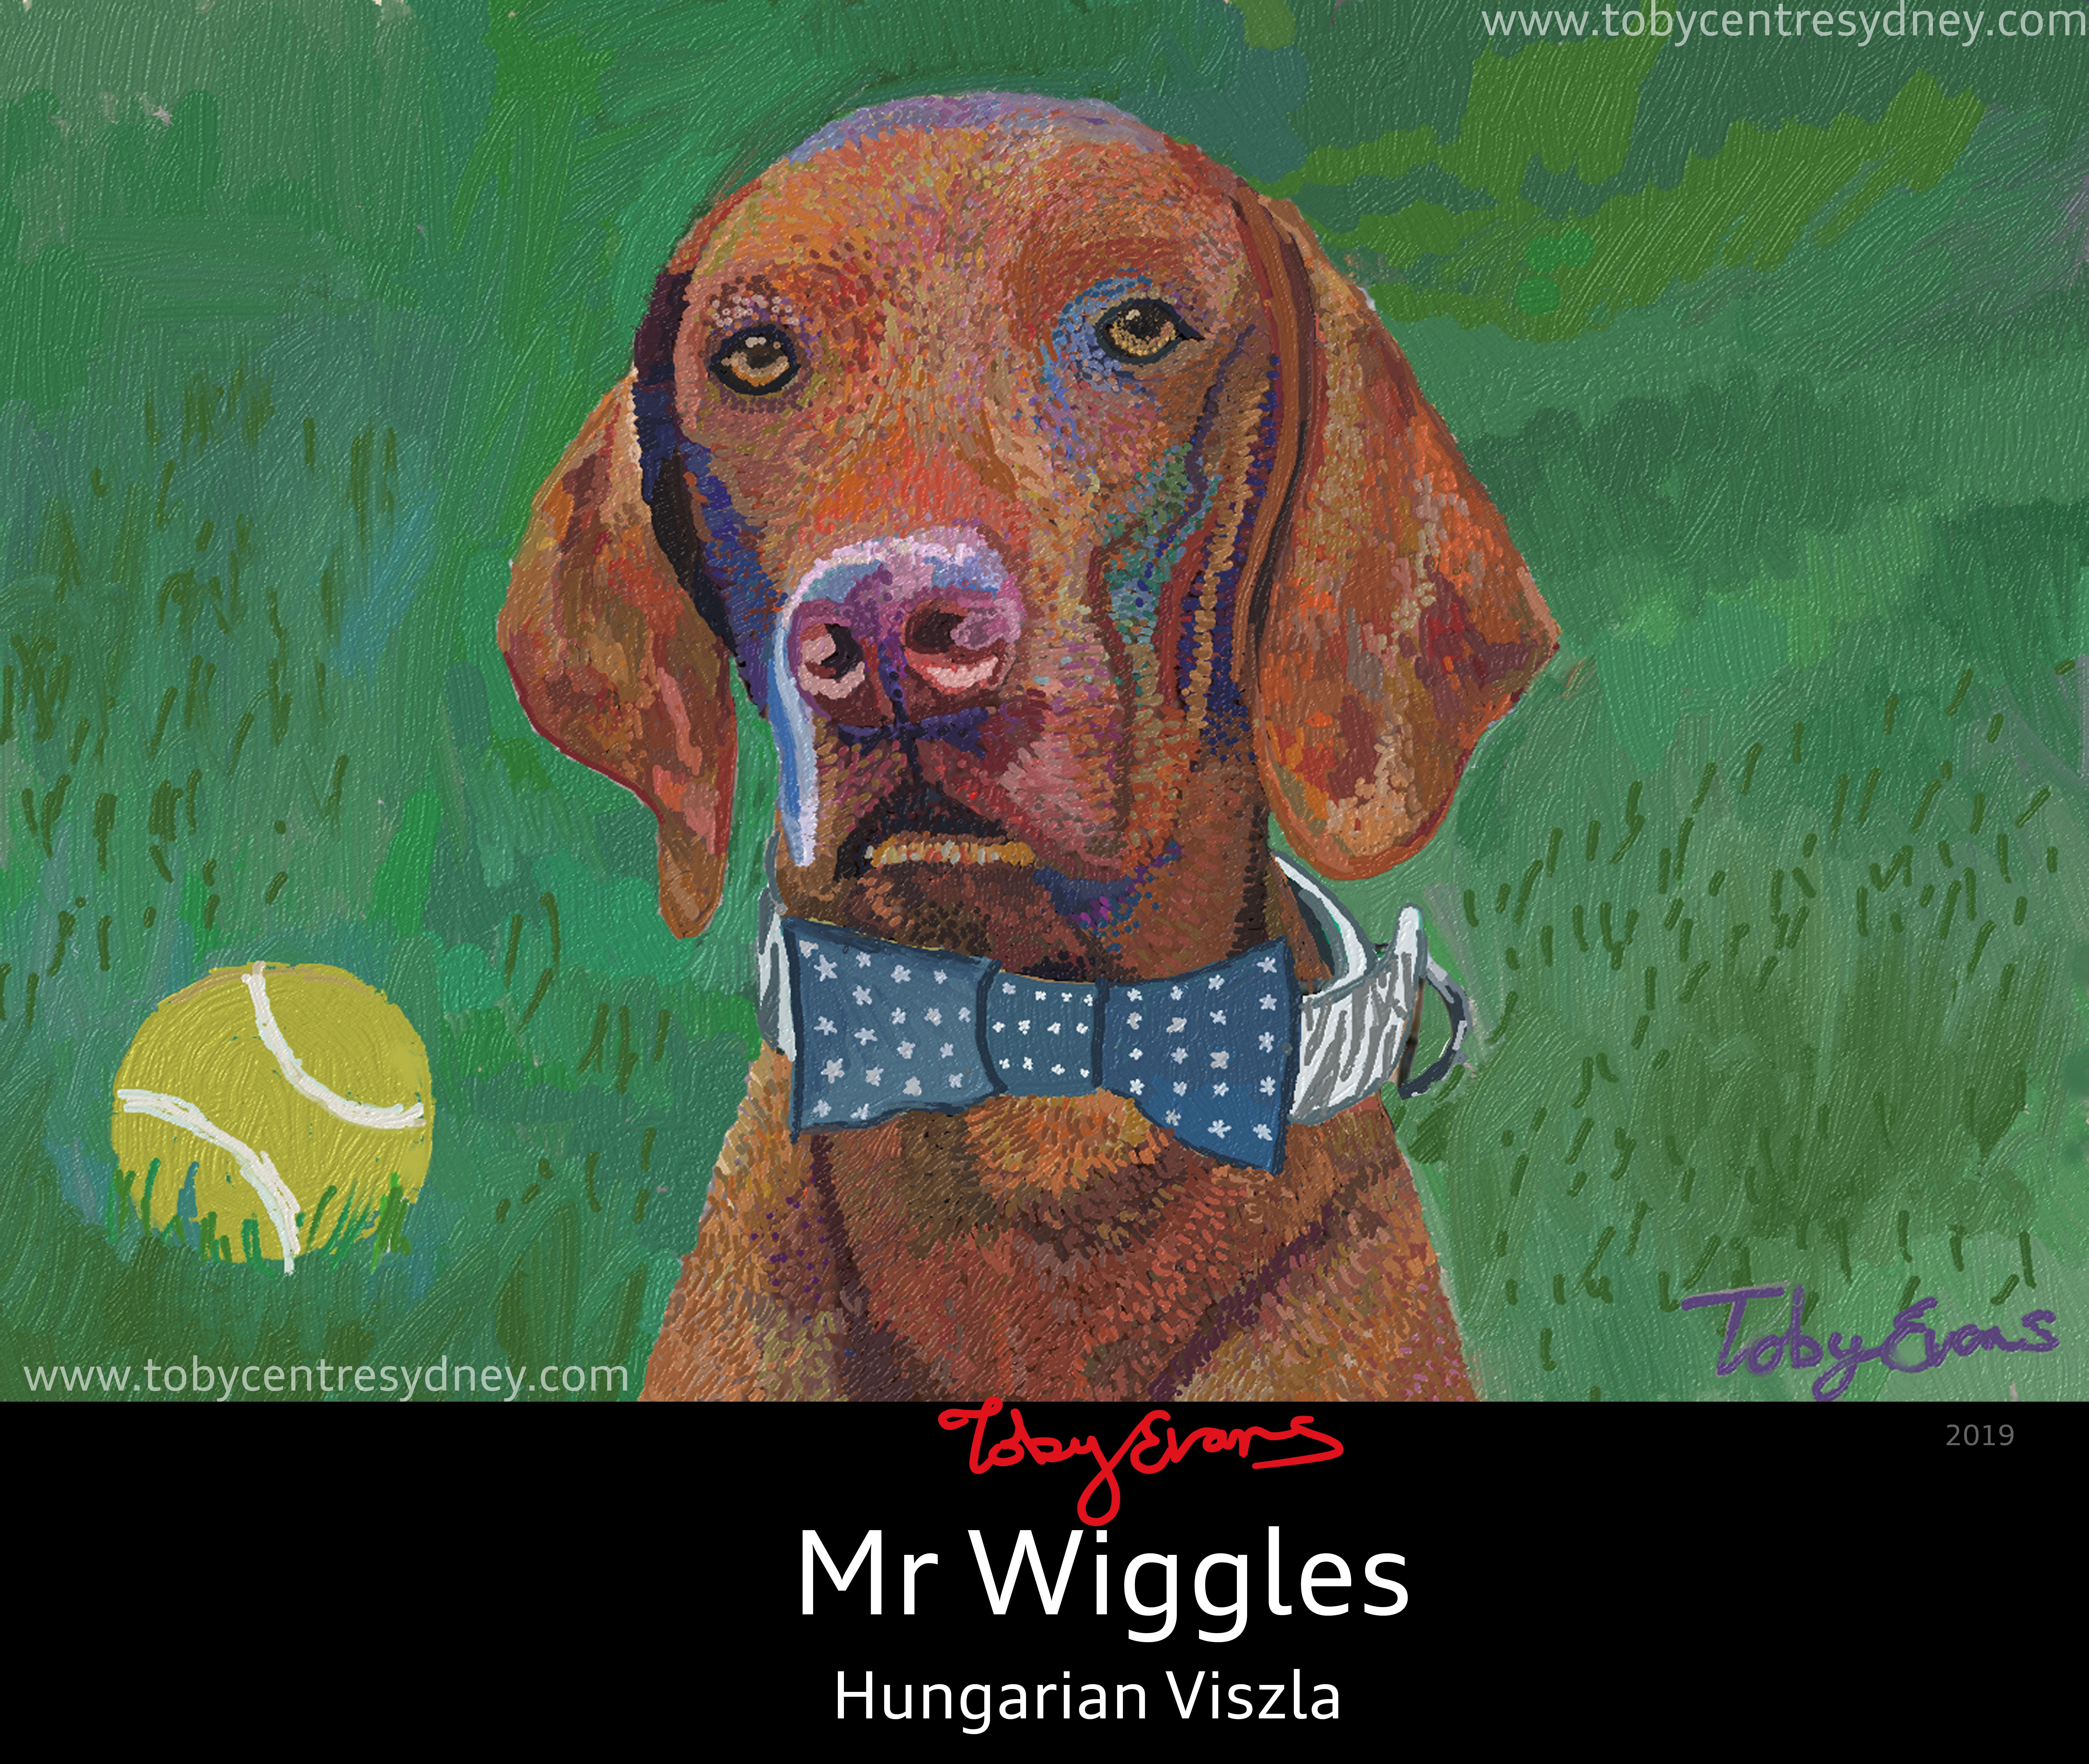 Sherlock - Mr Wiggles